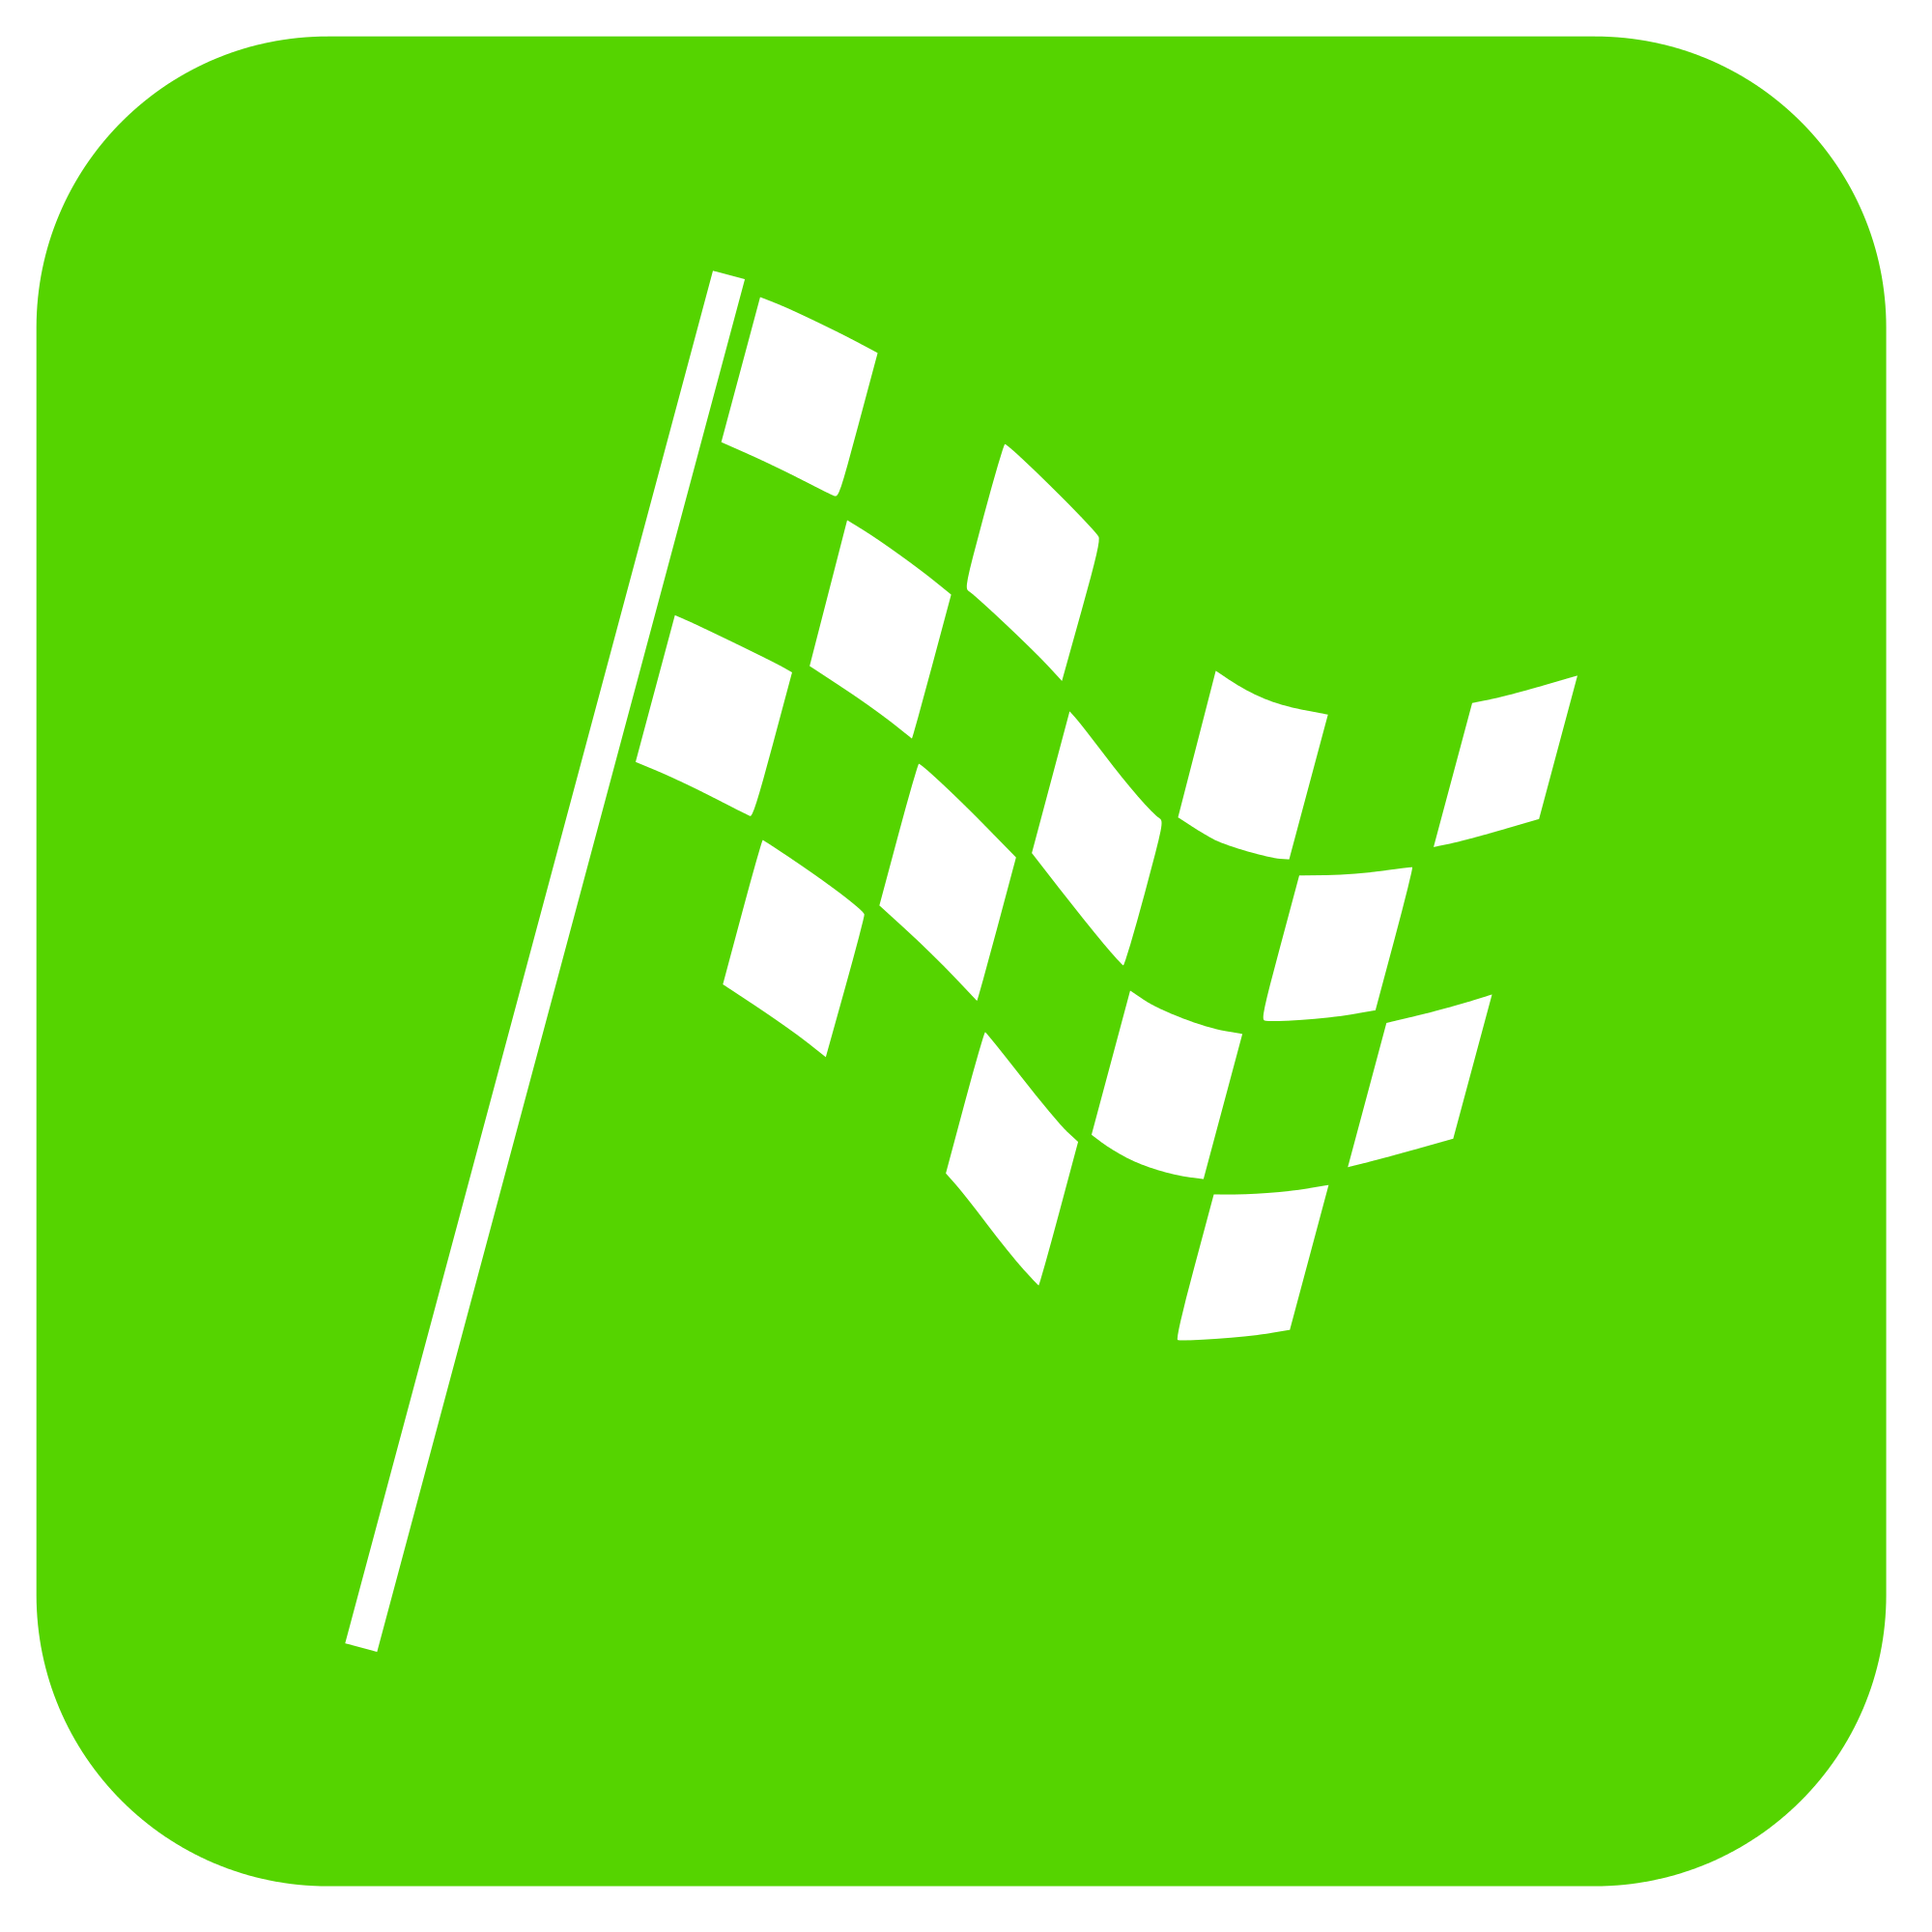 Checkered Flag Icon - Cliparts.co